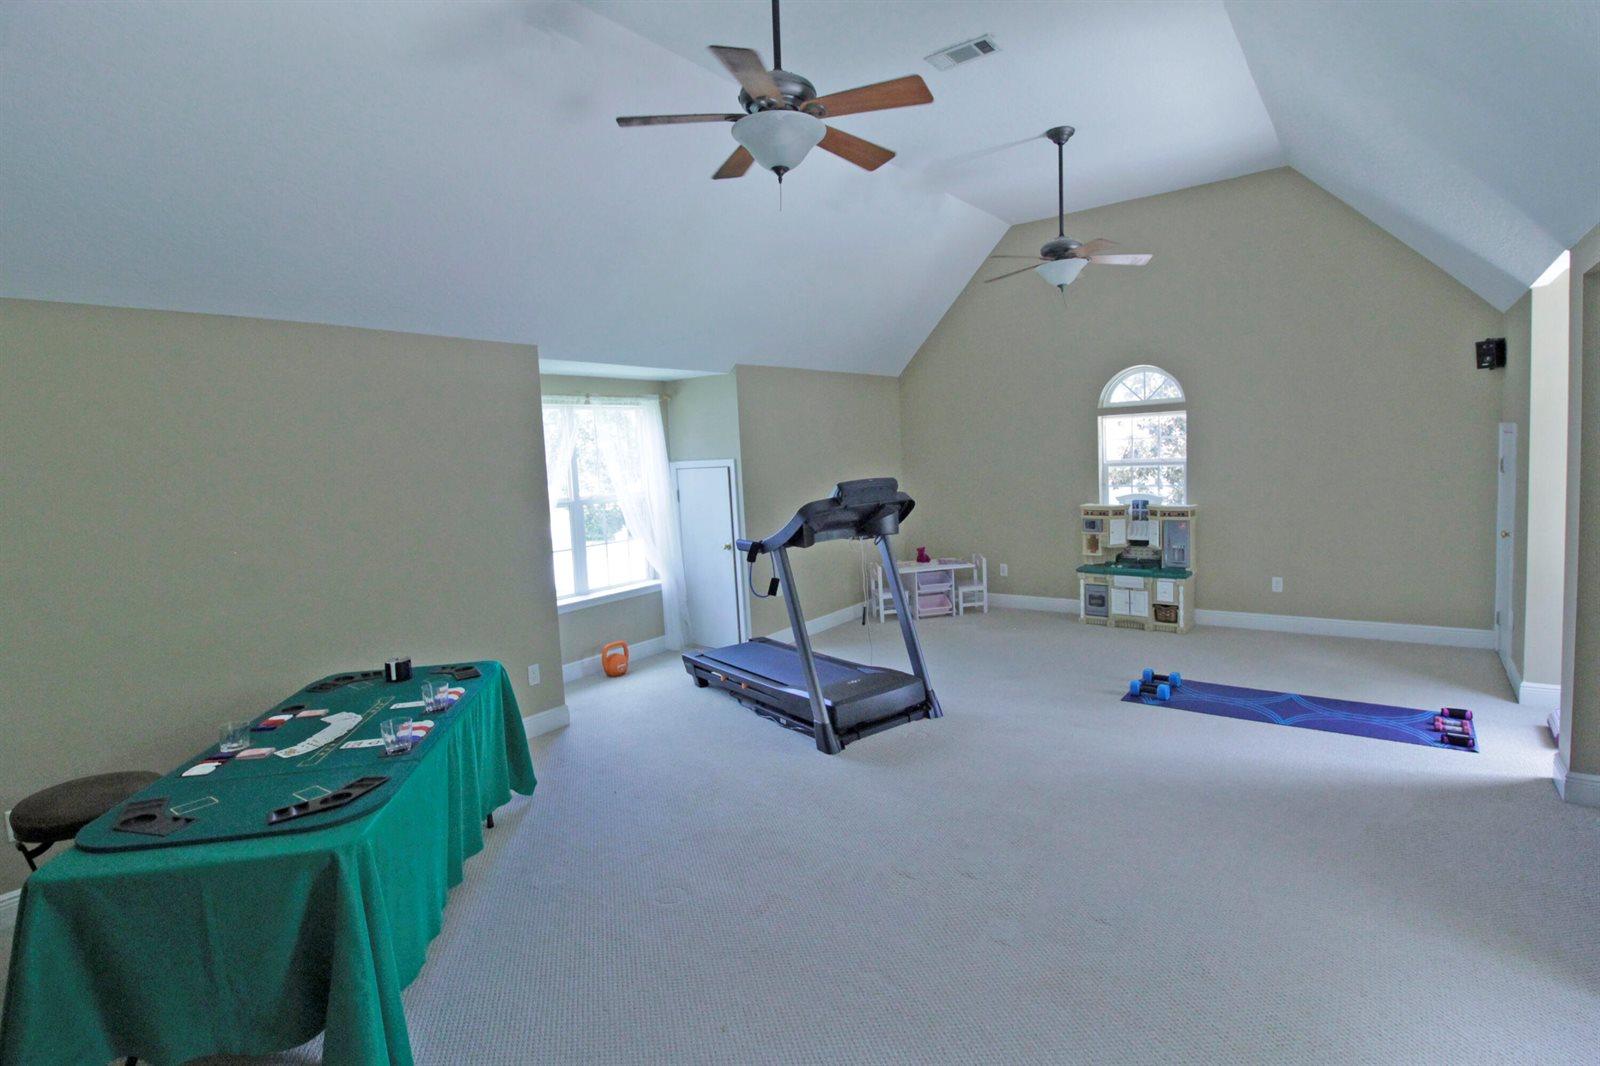 1004 Crooked Creek Cove, Niceville, FL 32578